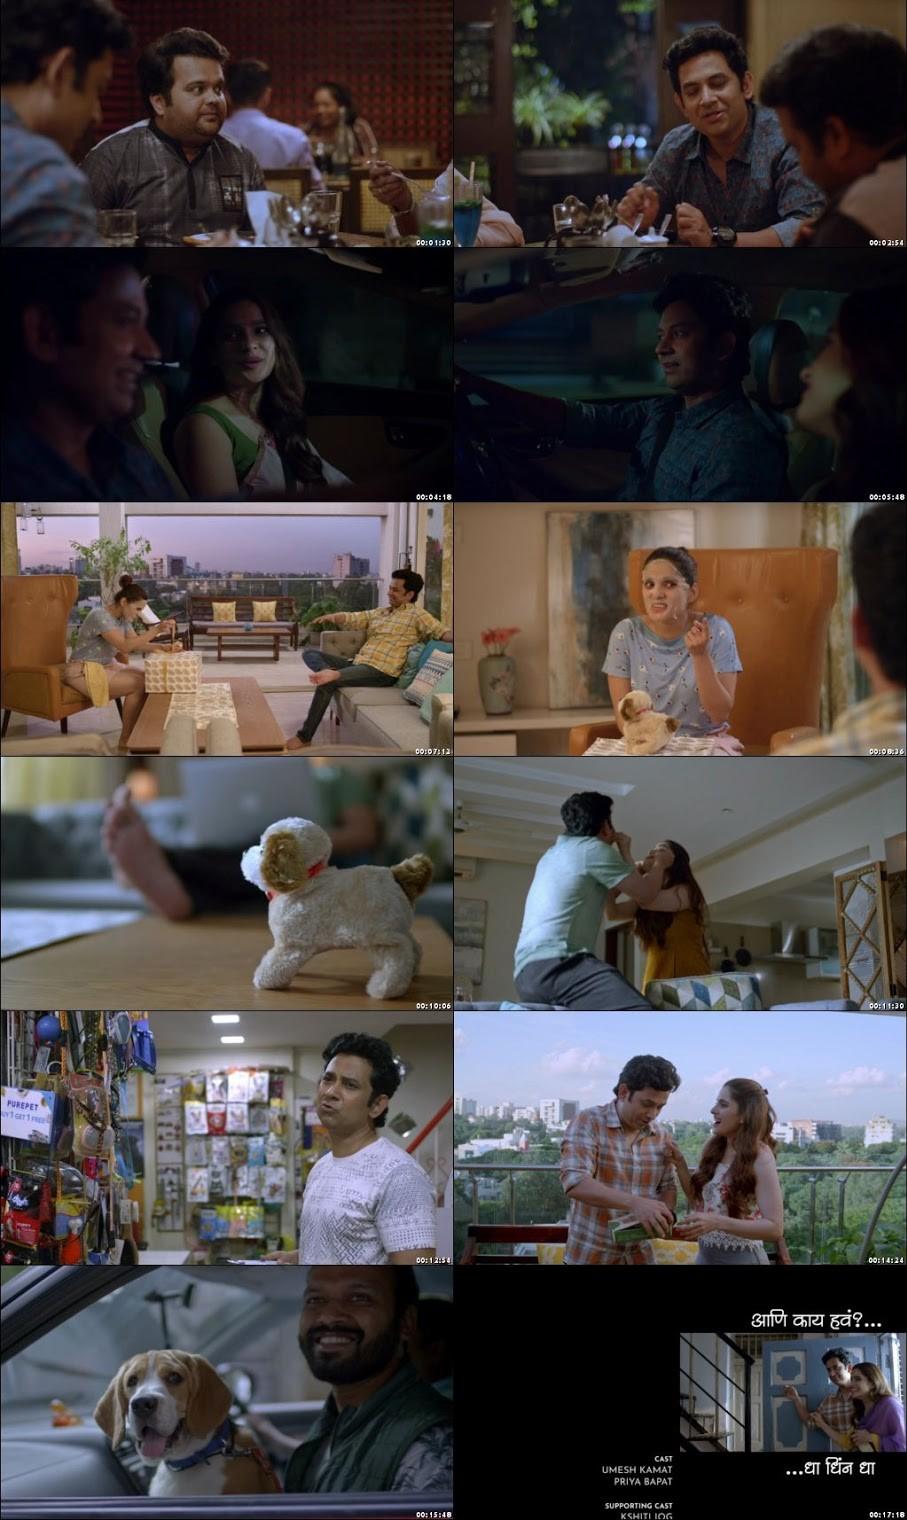 Aur Kya Chahiye 2020 Complete S02 Full Hindi Episode Online Watch